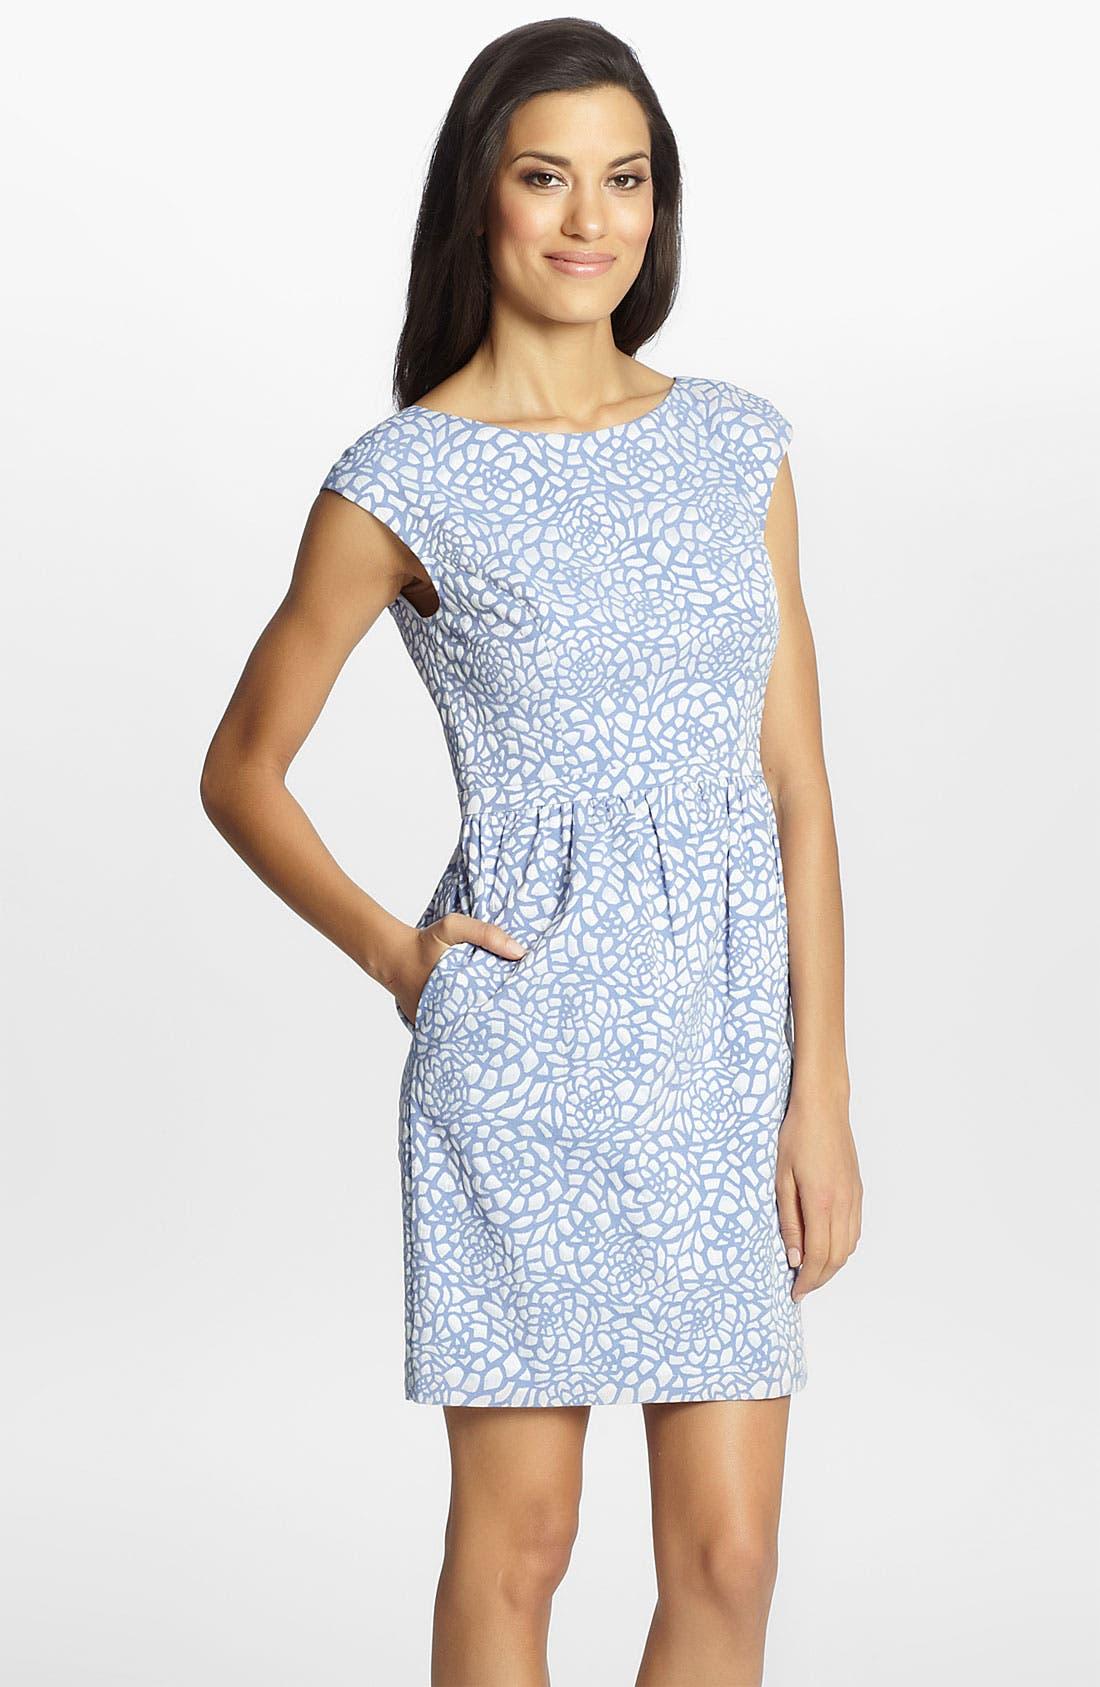 Alternate Image 1 Selected - Cynthia Steffe 'Jasmine' Print Jacquard Dress